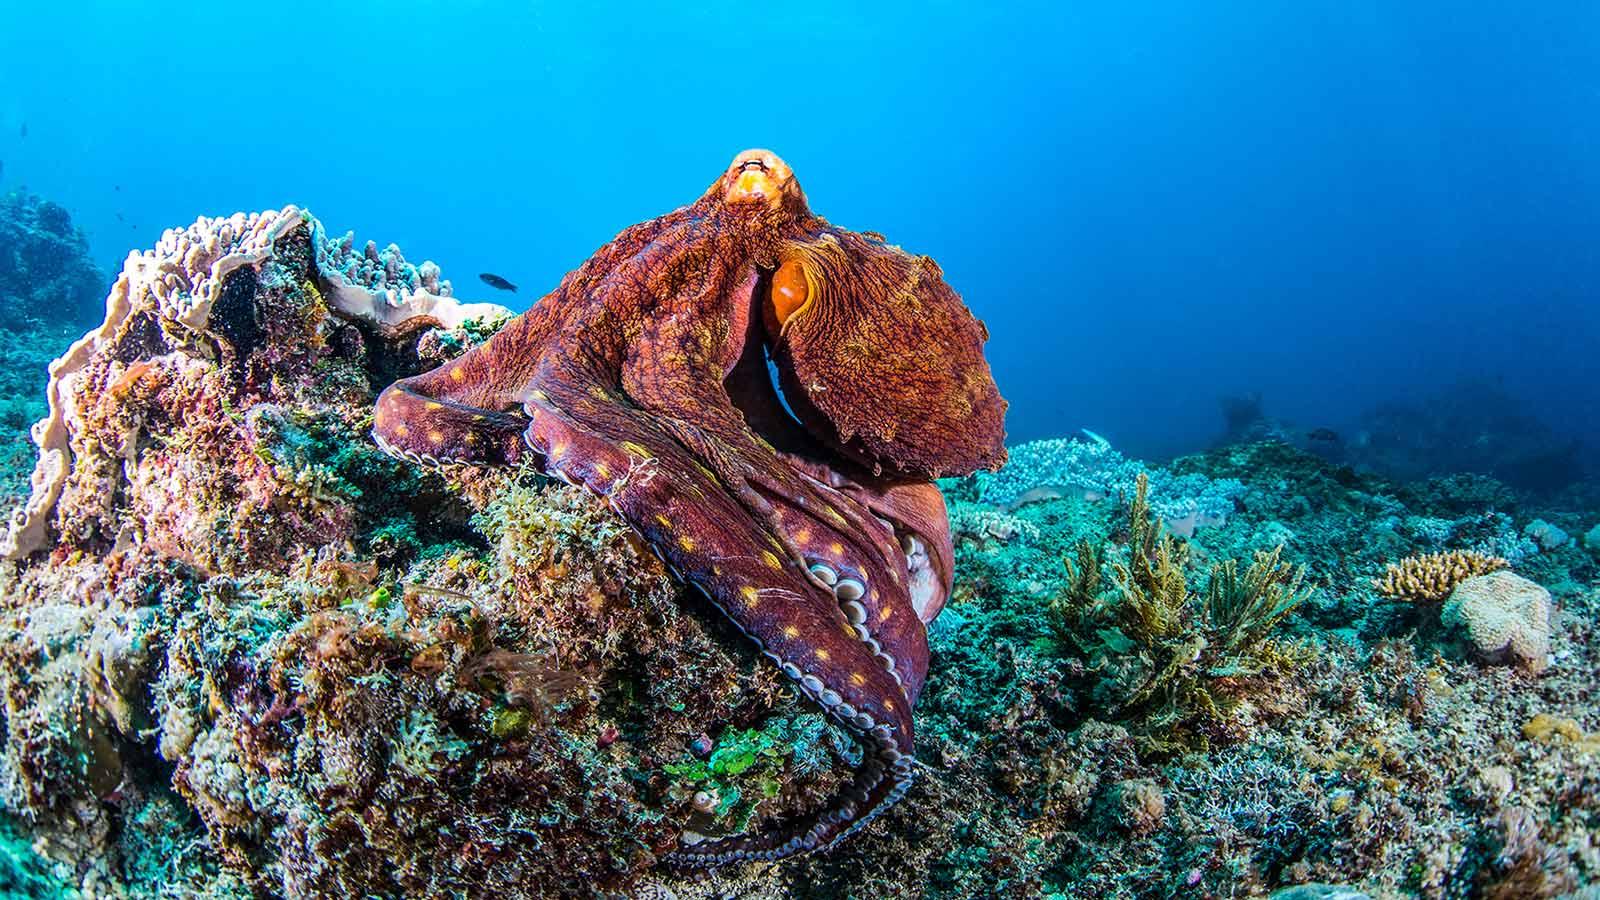 Scuba Diving Kenya Octopus